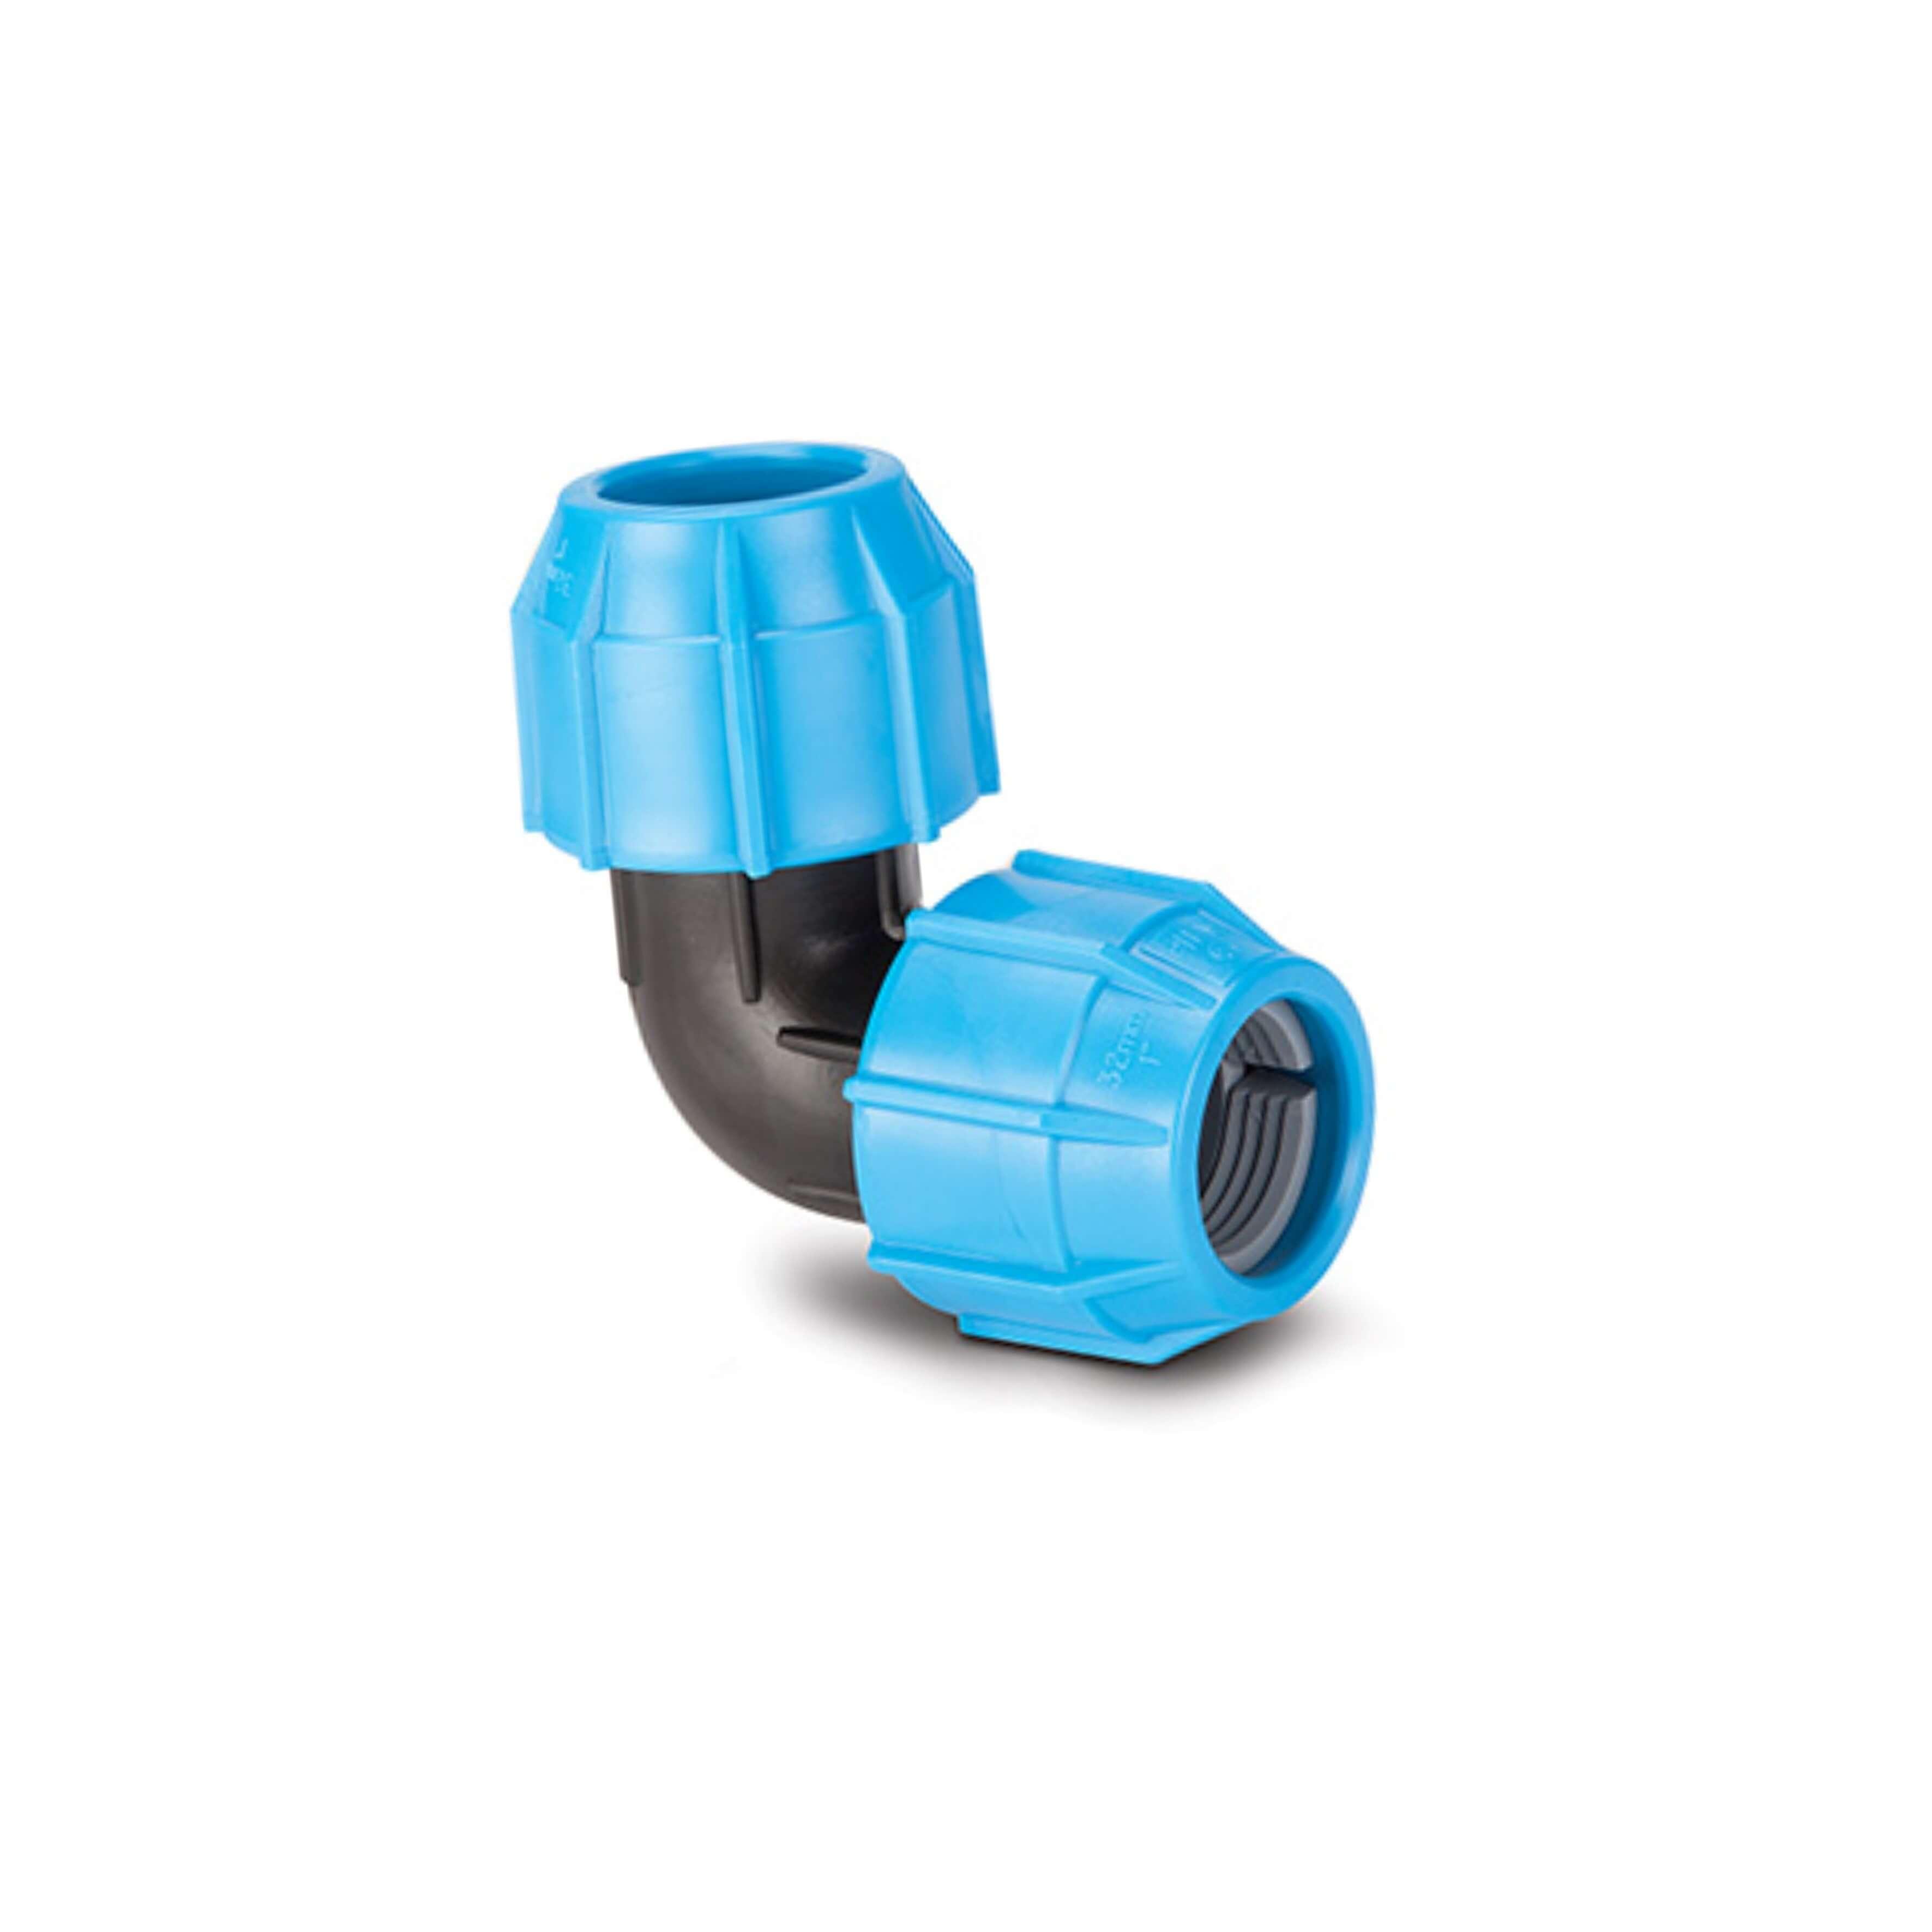 Polyfast 25mm Elbow 40125